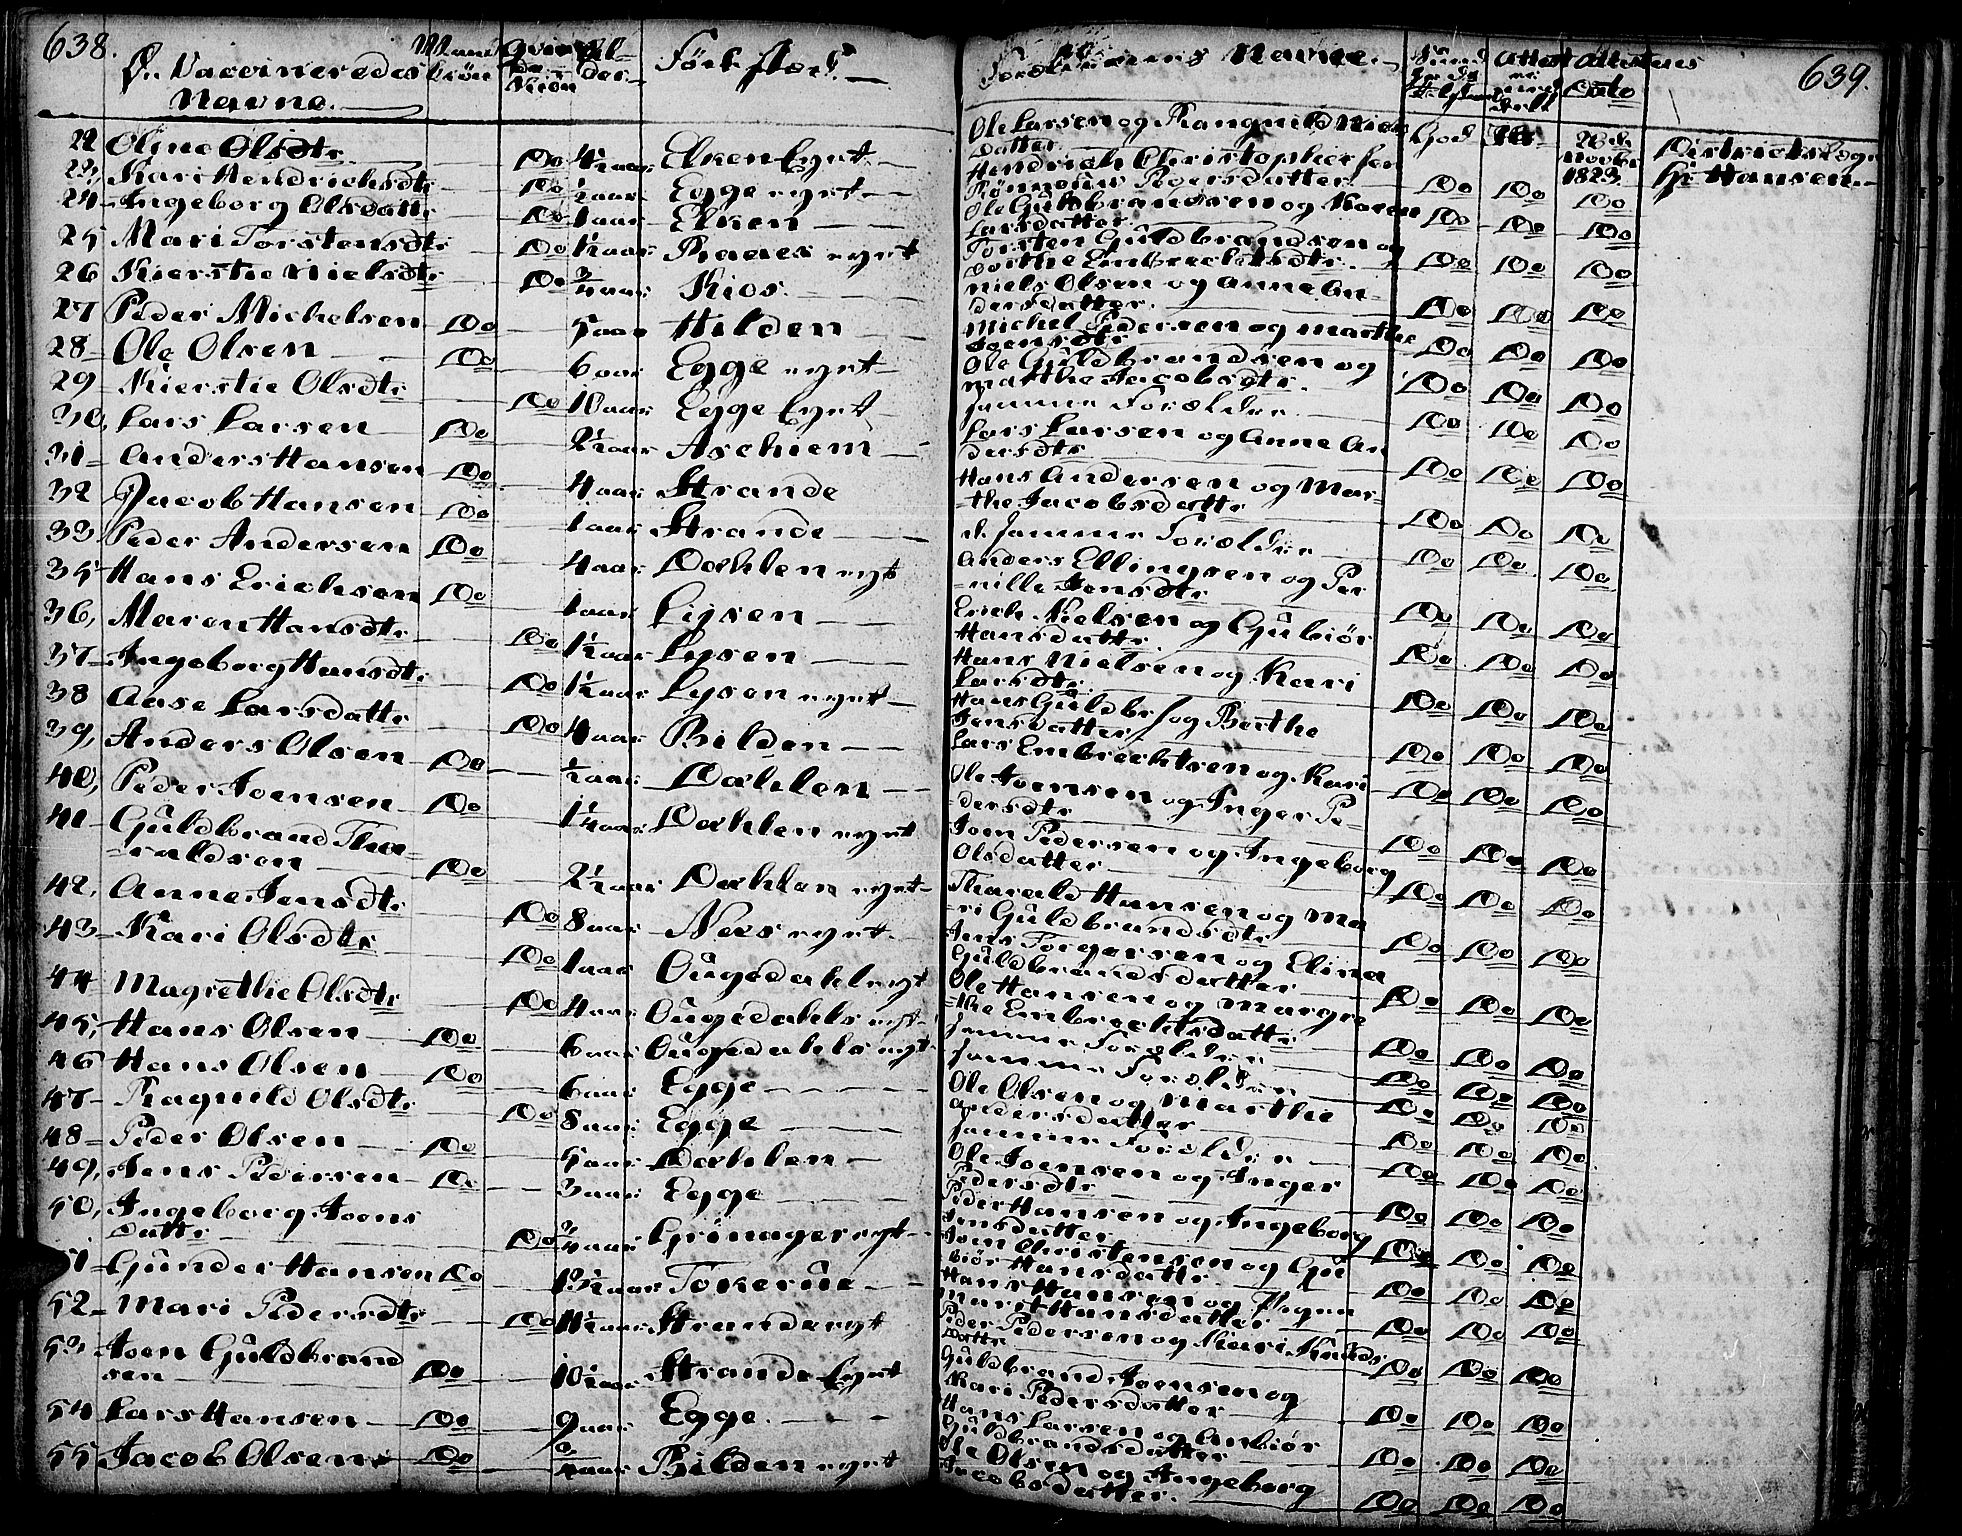 SAH, Gran prestekontor, Ministerialbok nr. 6, 1787-1824, s. 638-639